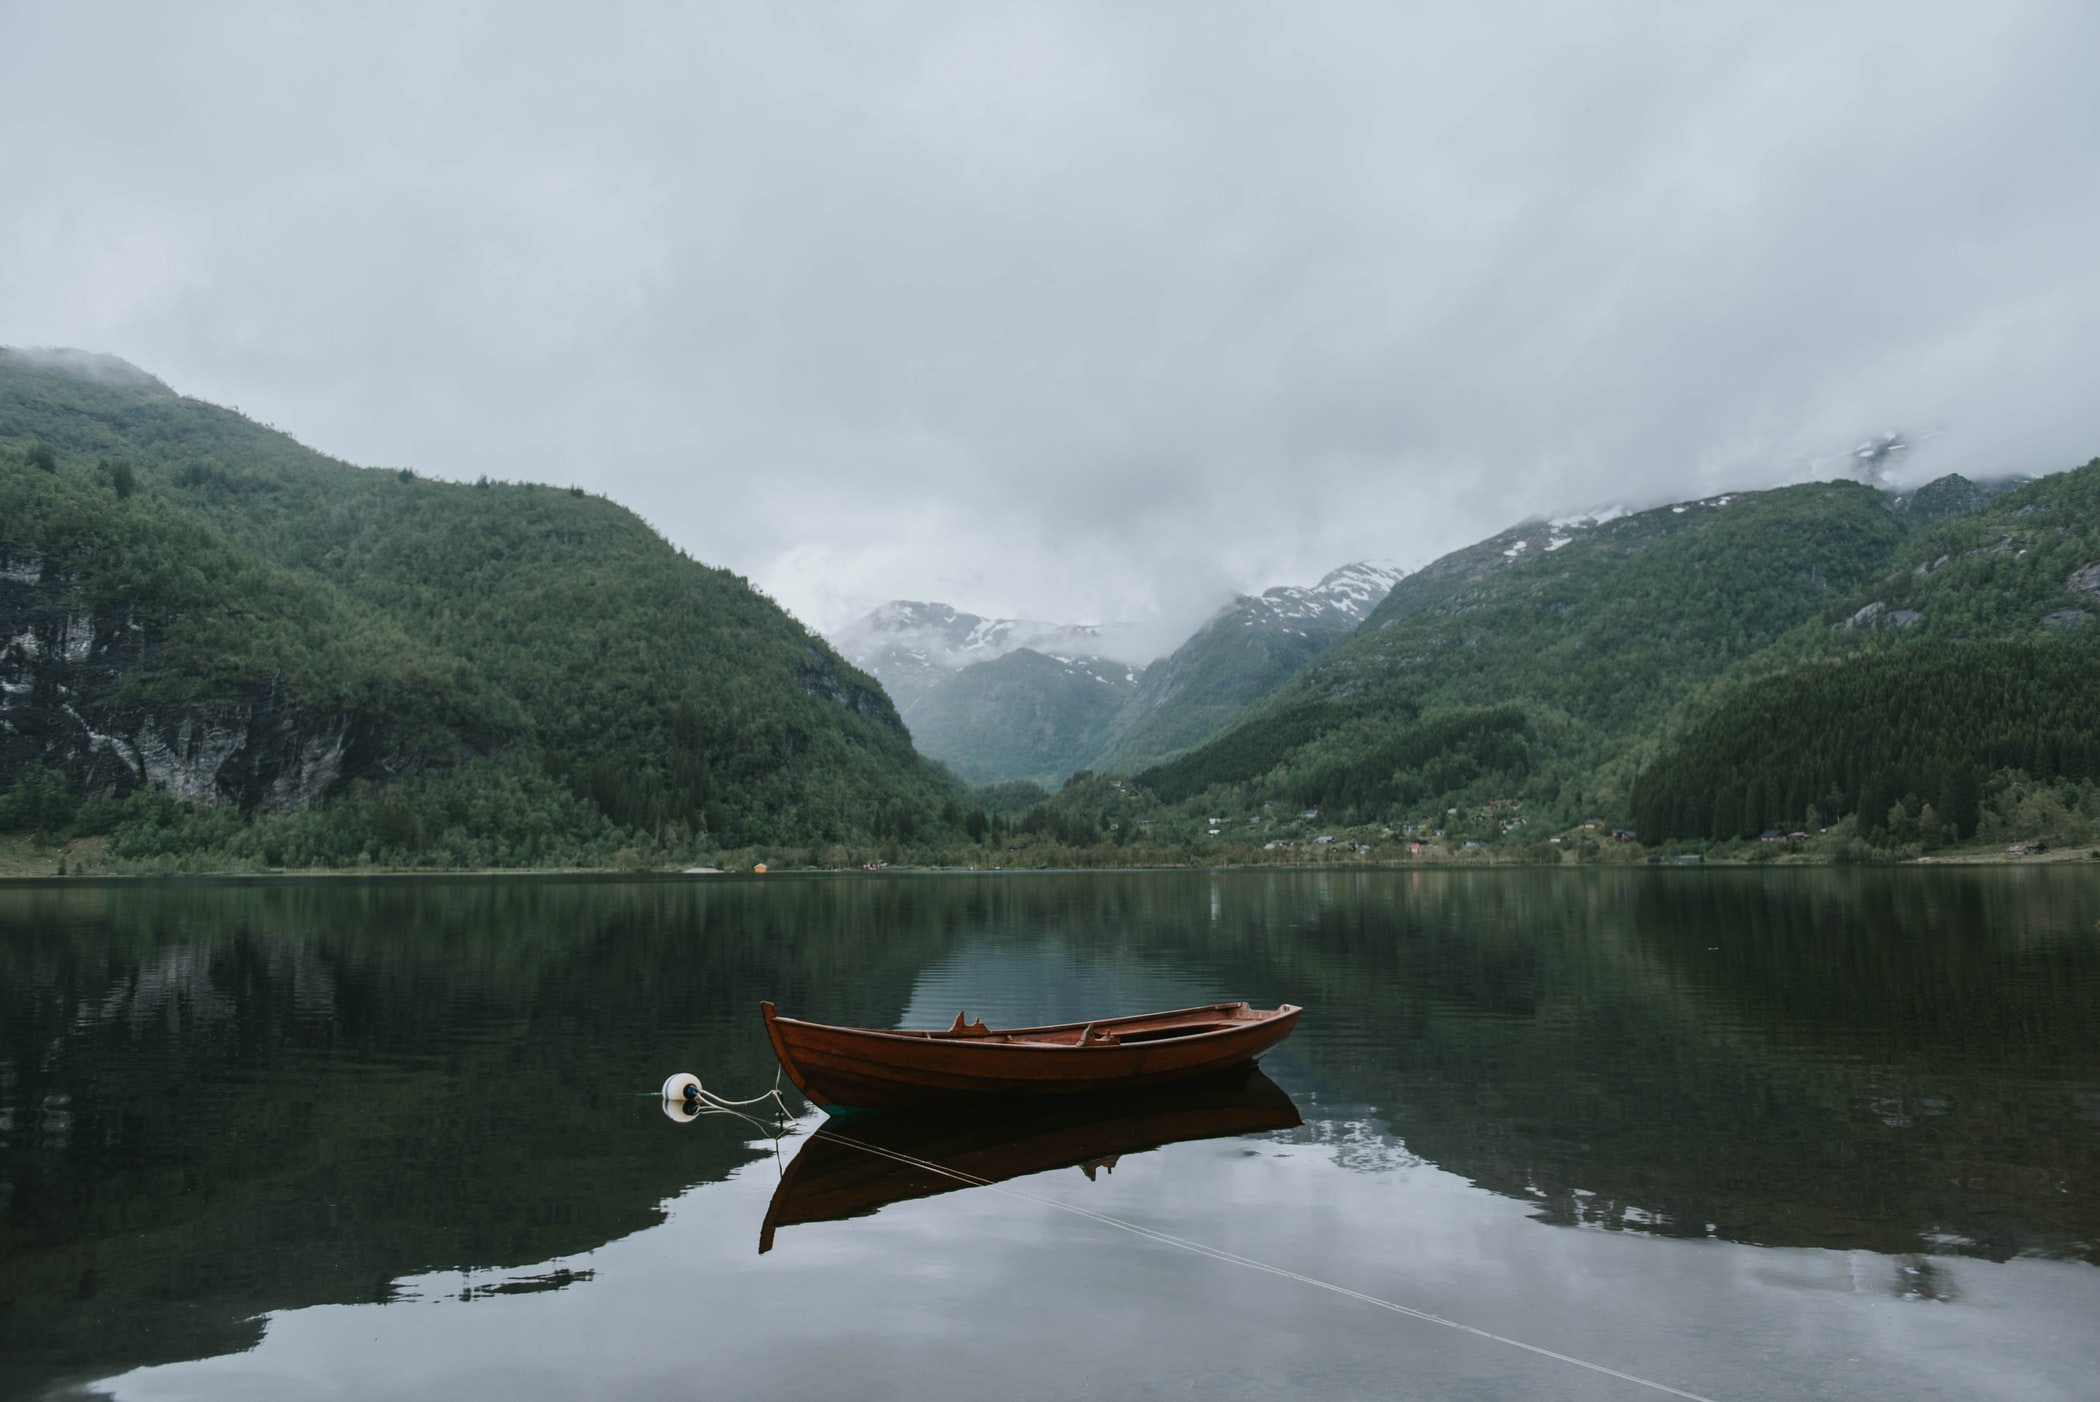 Renditud bussiga kalareis Norra